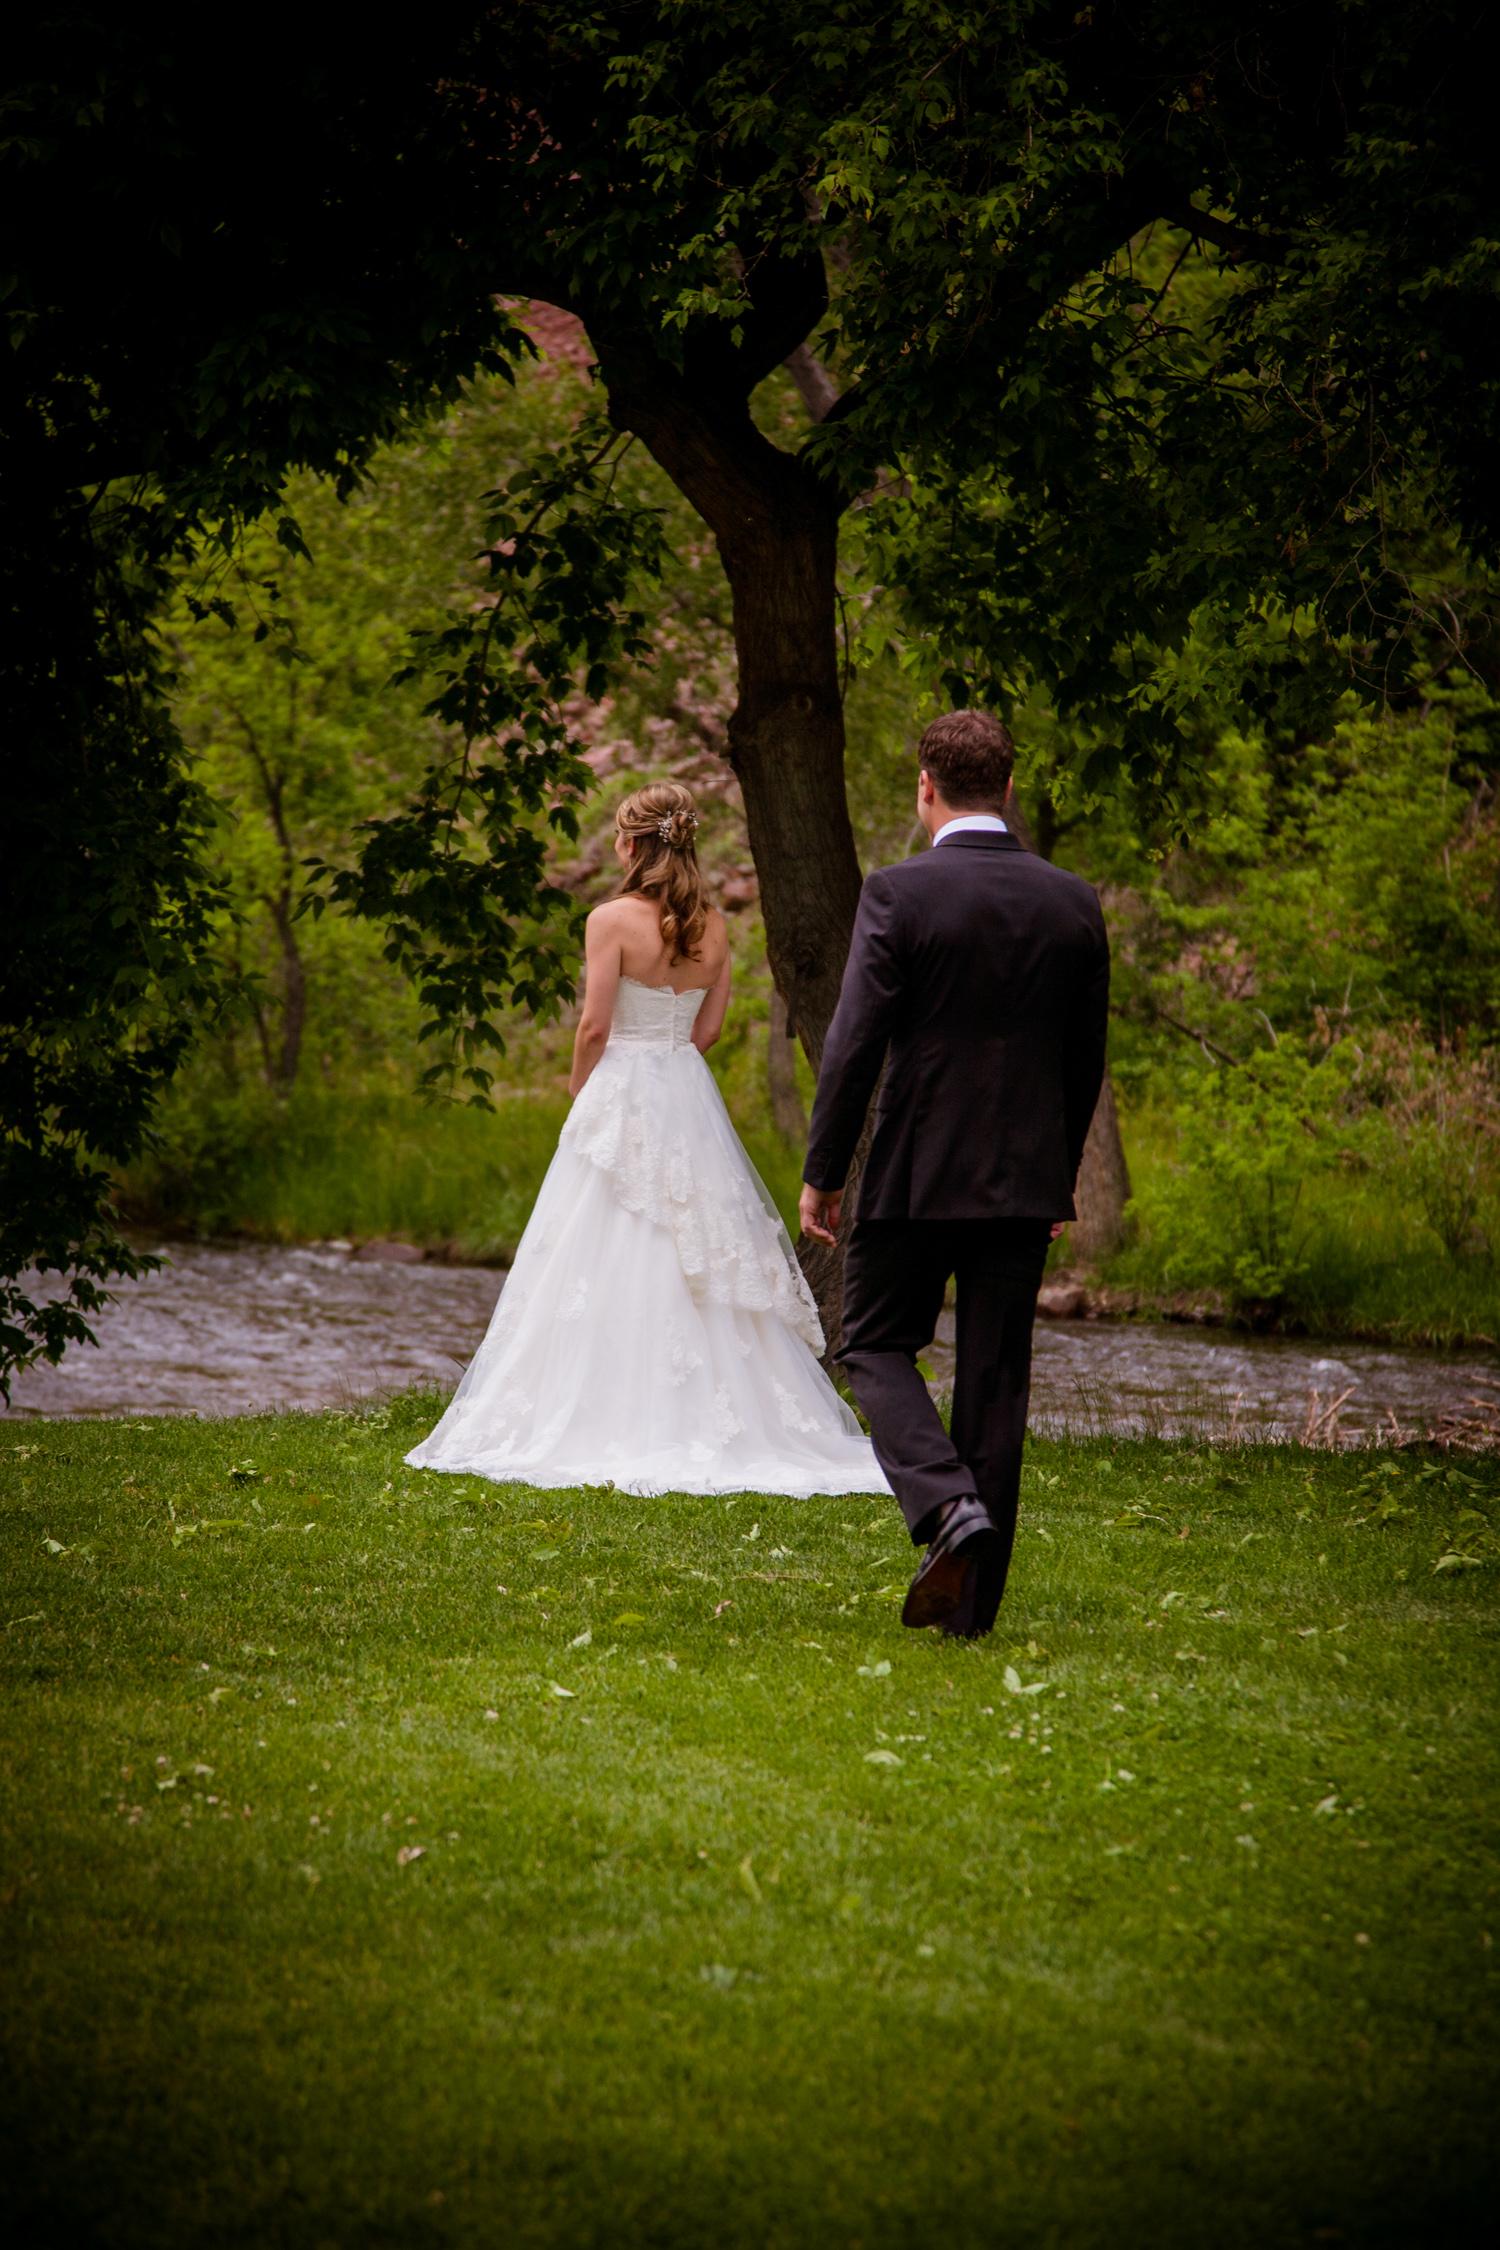 Planet_Bluegrass_Lyons_Wedding_020.JPG